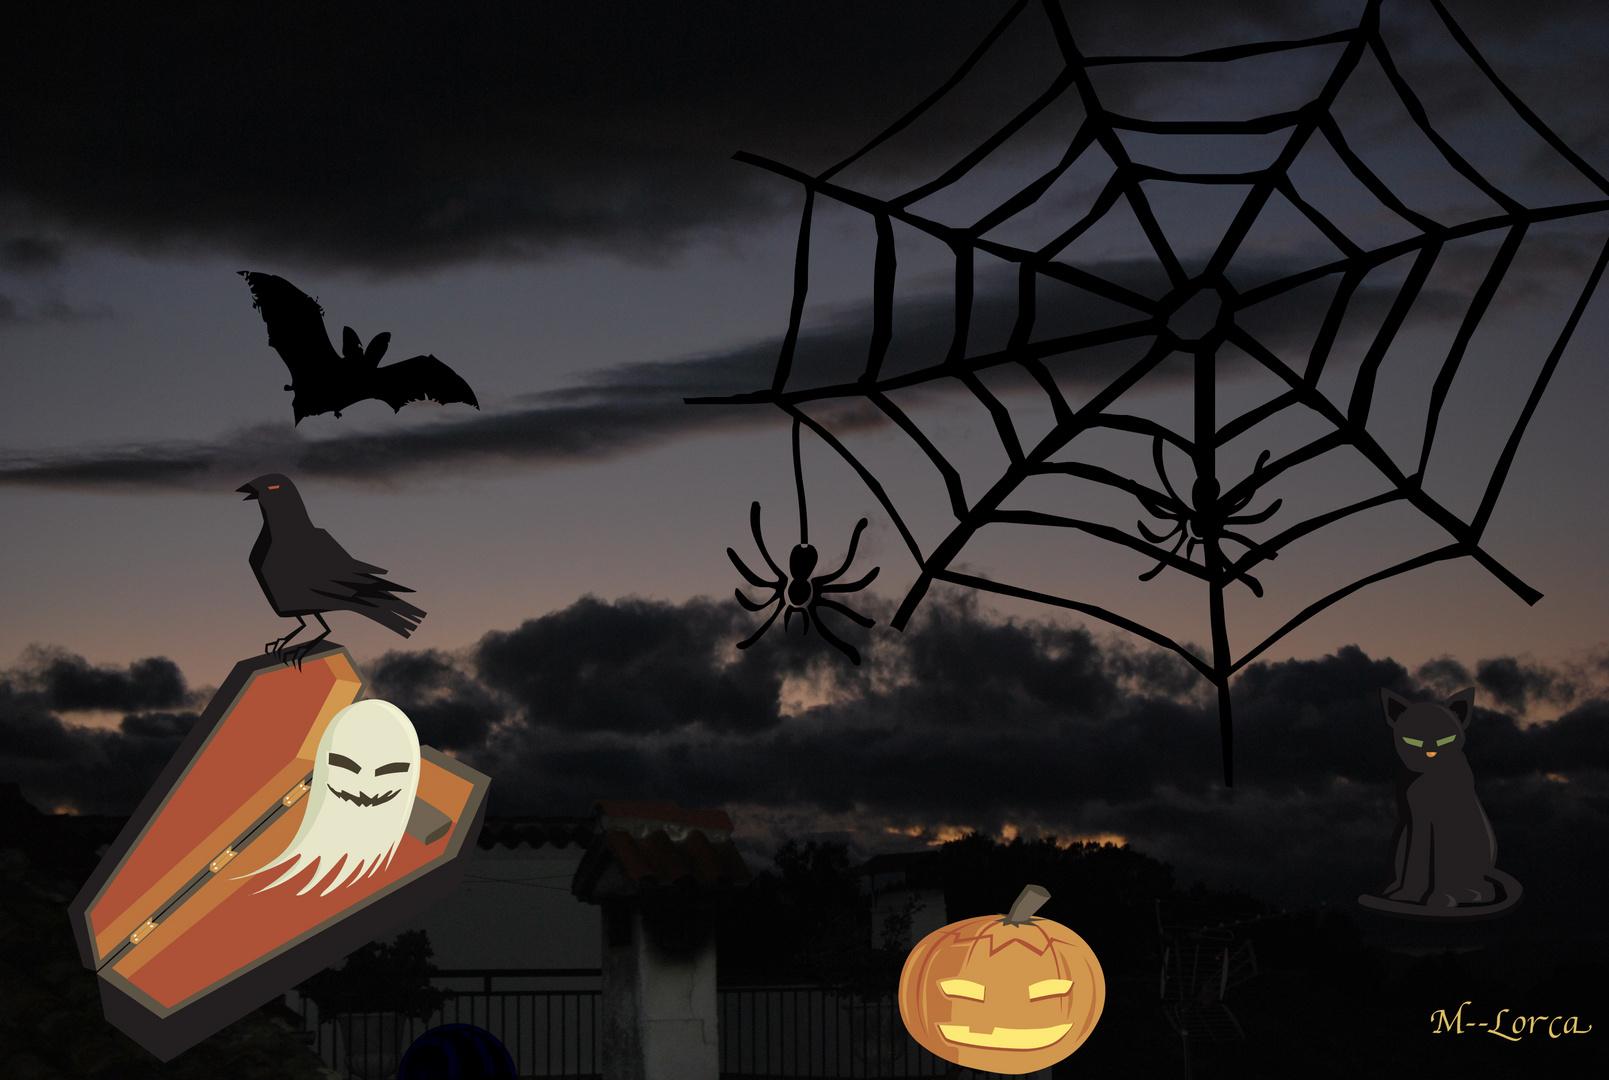 halowen foto hecha desde mi balcon